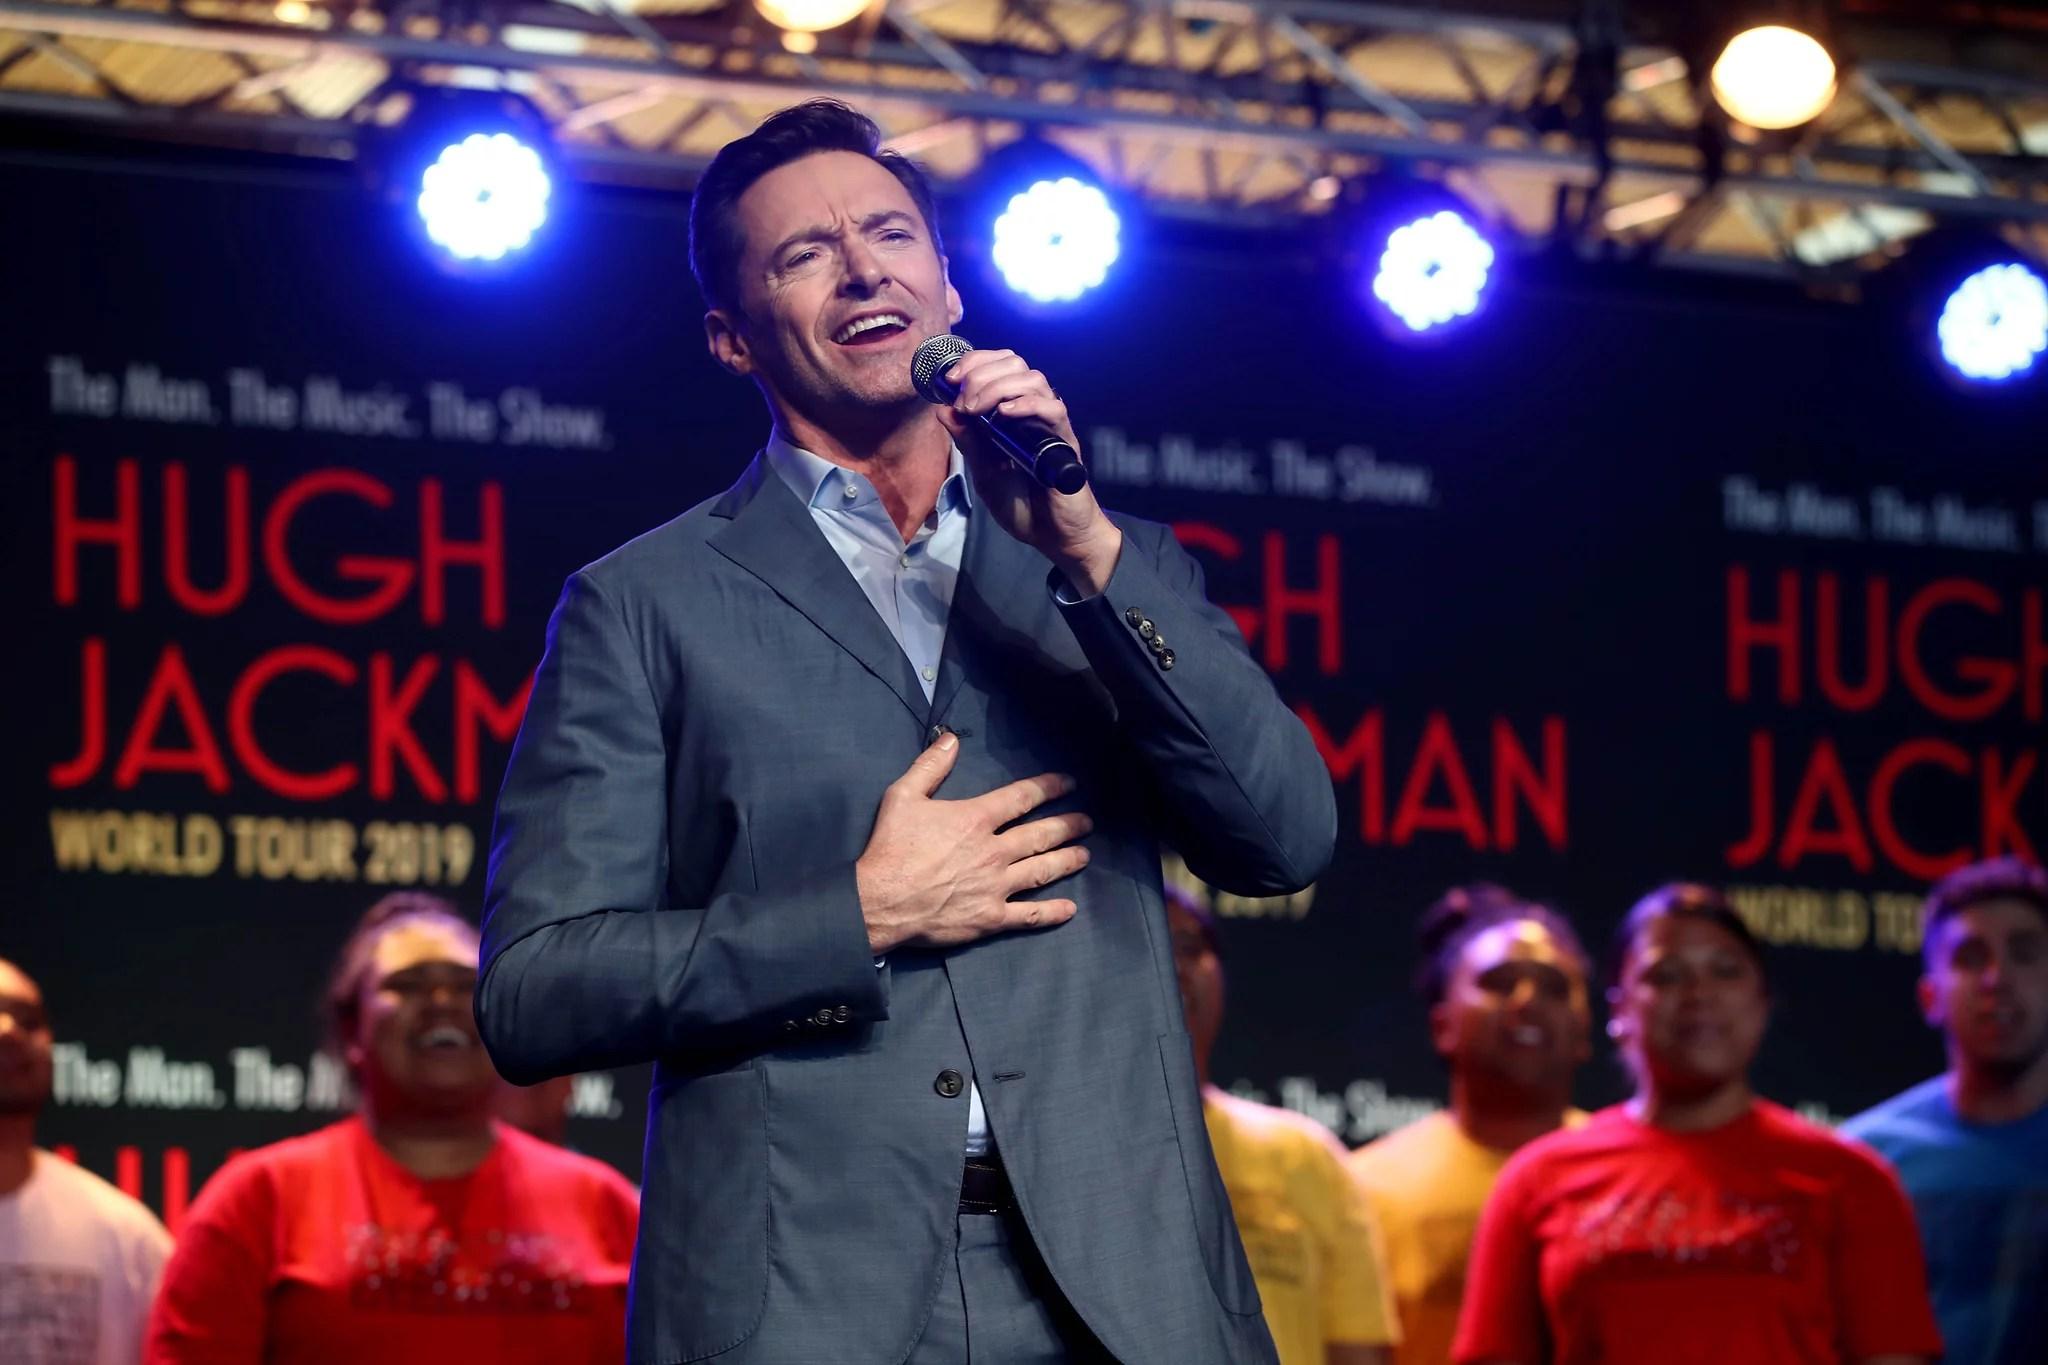 Hugh Jackman Starring In Broadway Revival Of The Music Man POPSUGAR Australia Entertainment